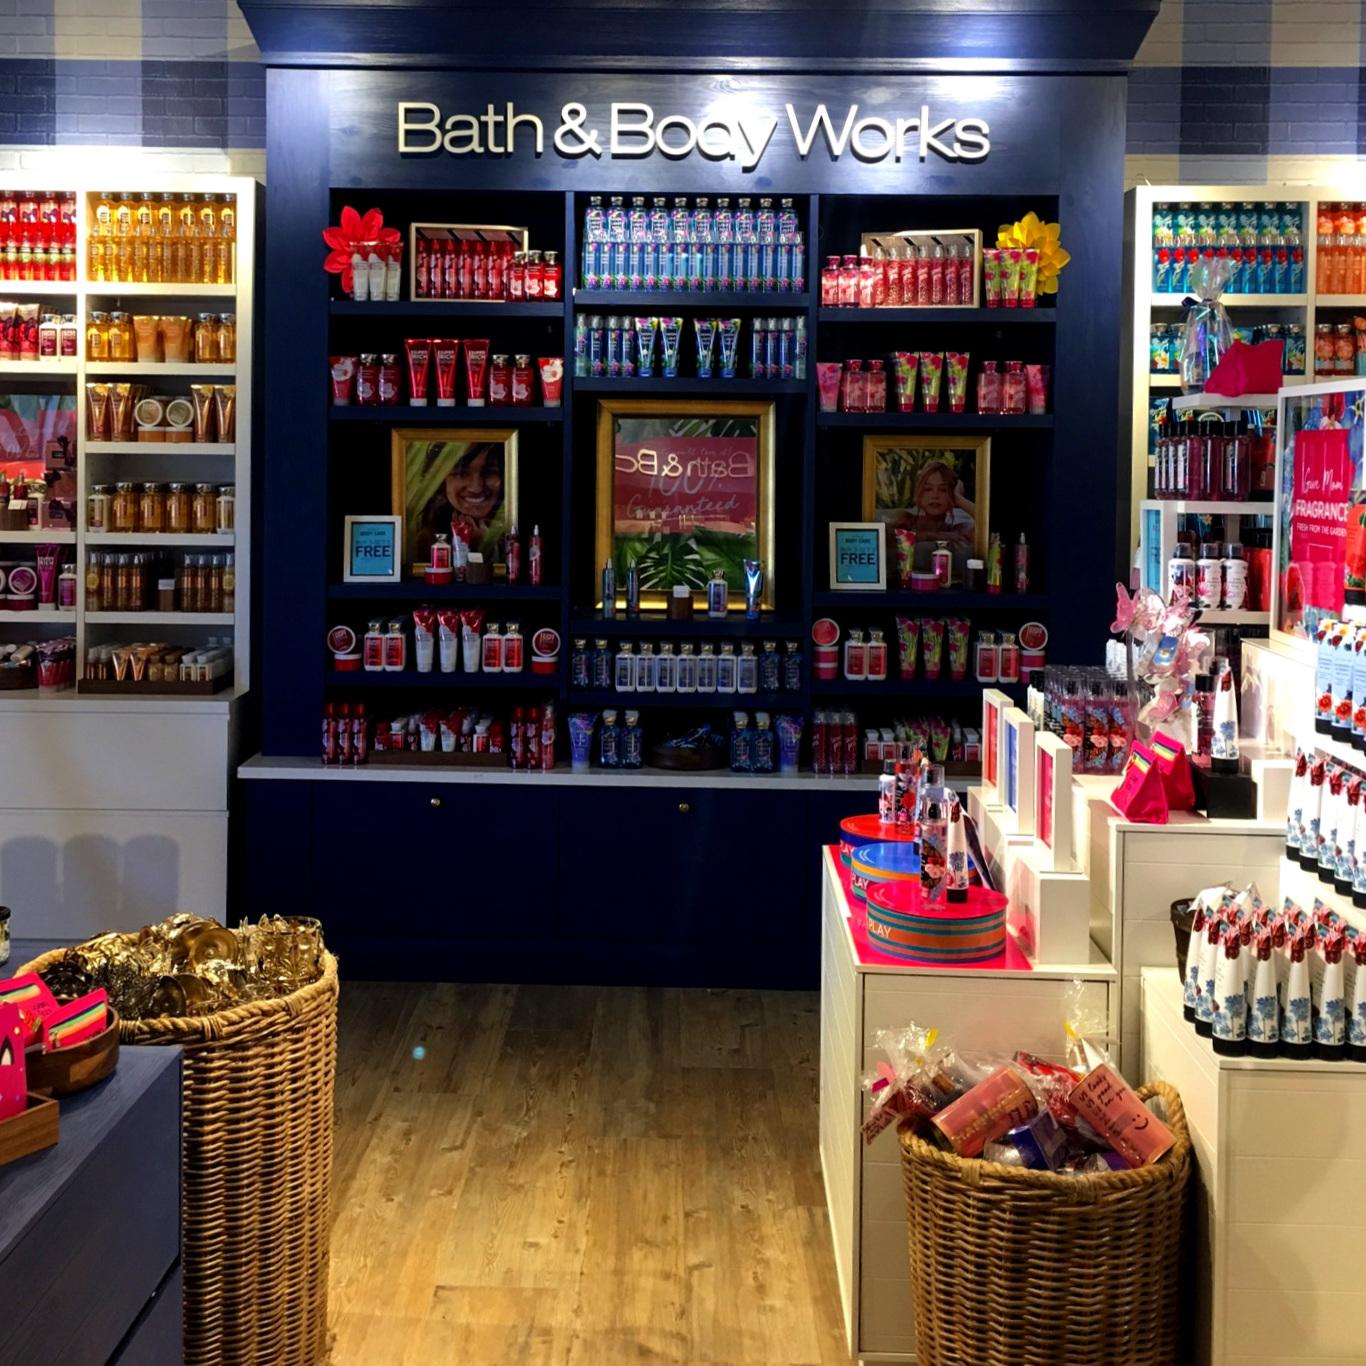 BATH & BODY WORKS  Since 1993